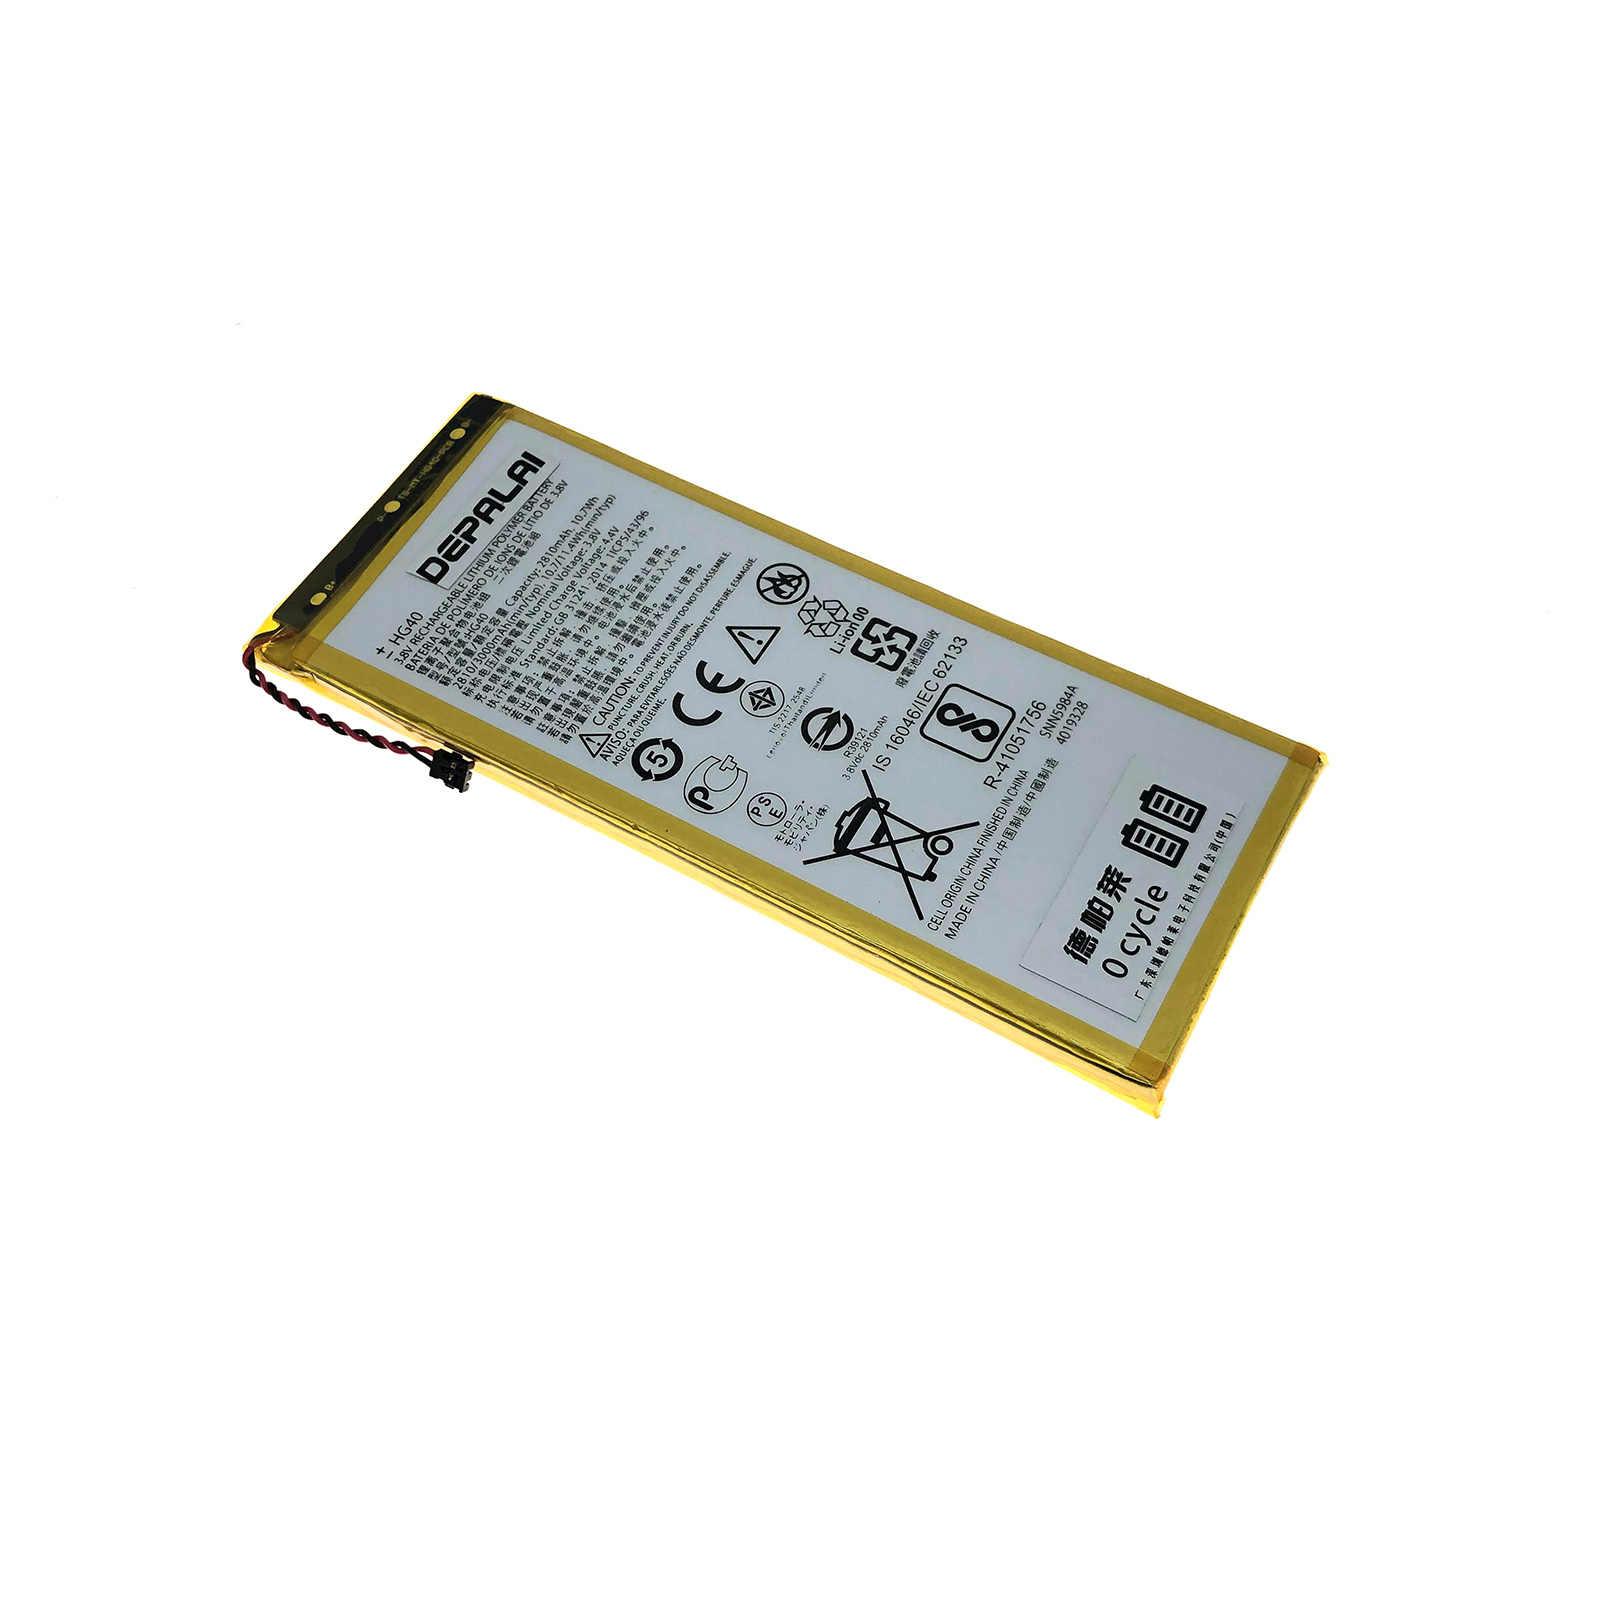 Motorol Moto G5 Plus XT1684 XT1685 XT1687 XT1681 휴대 전화 배터리 용 3500mAh HG40